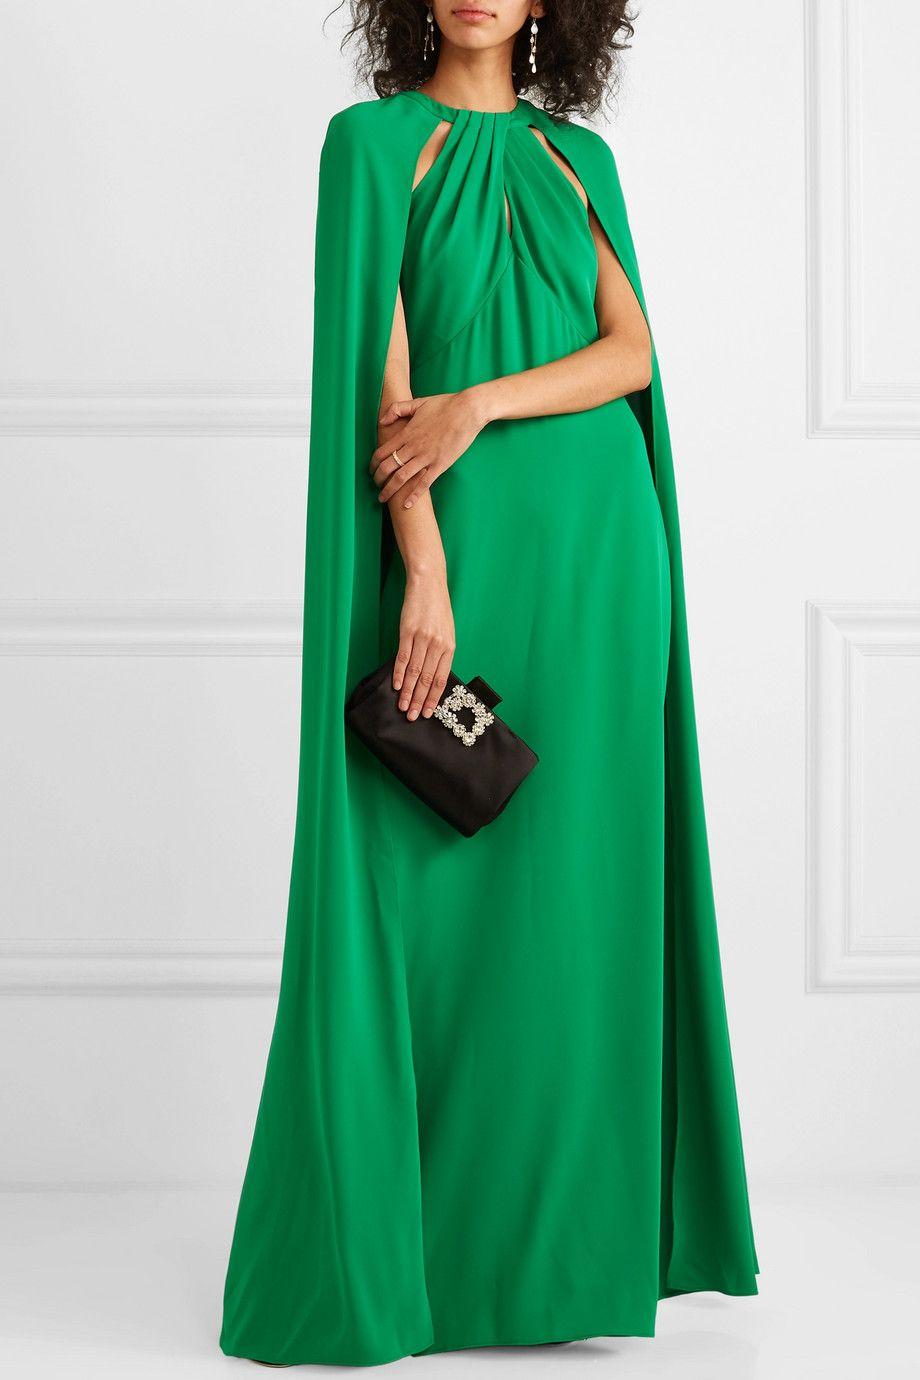 306017ffc105 What to Wear to a Summer 2019 Wedding - 15 Stylish Summer Wedding Guest  Dresses